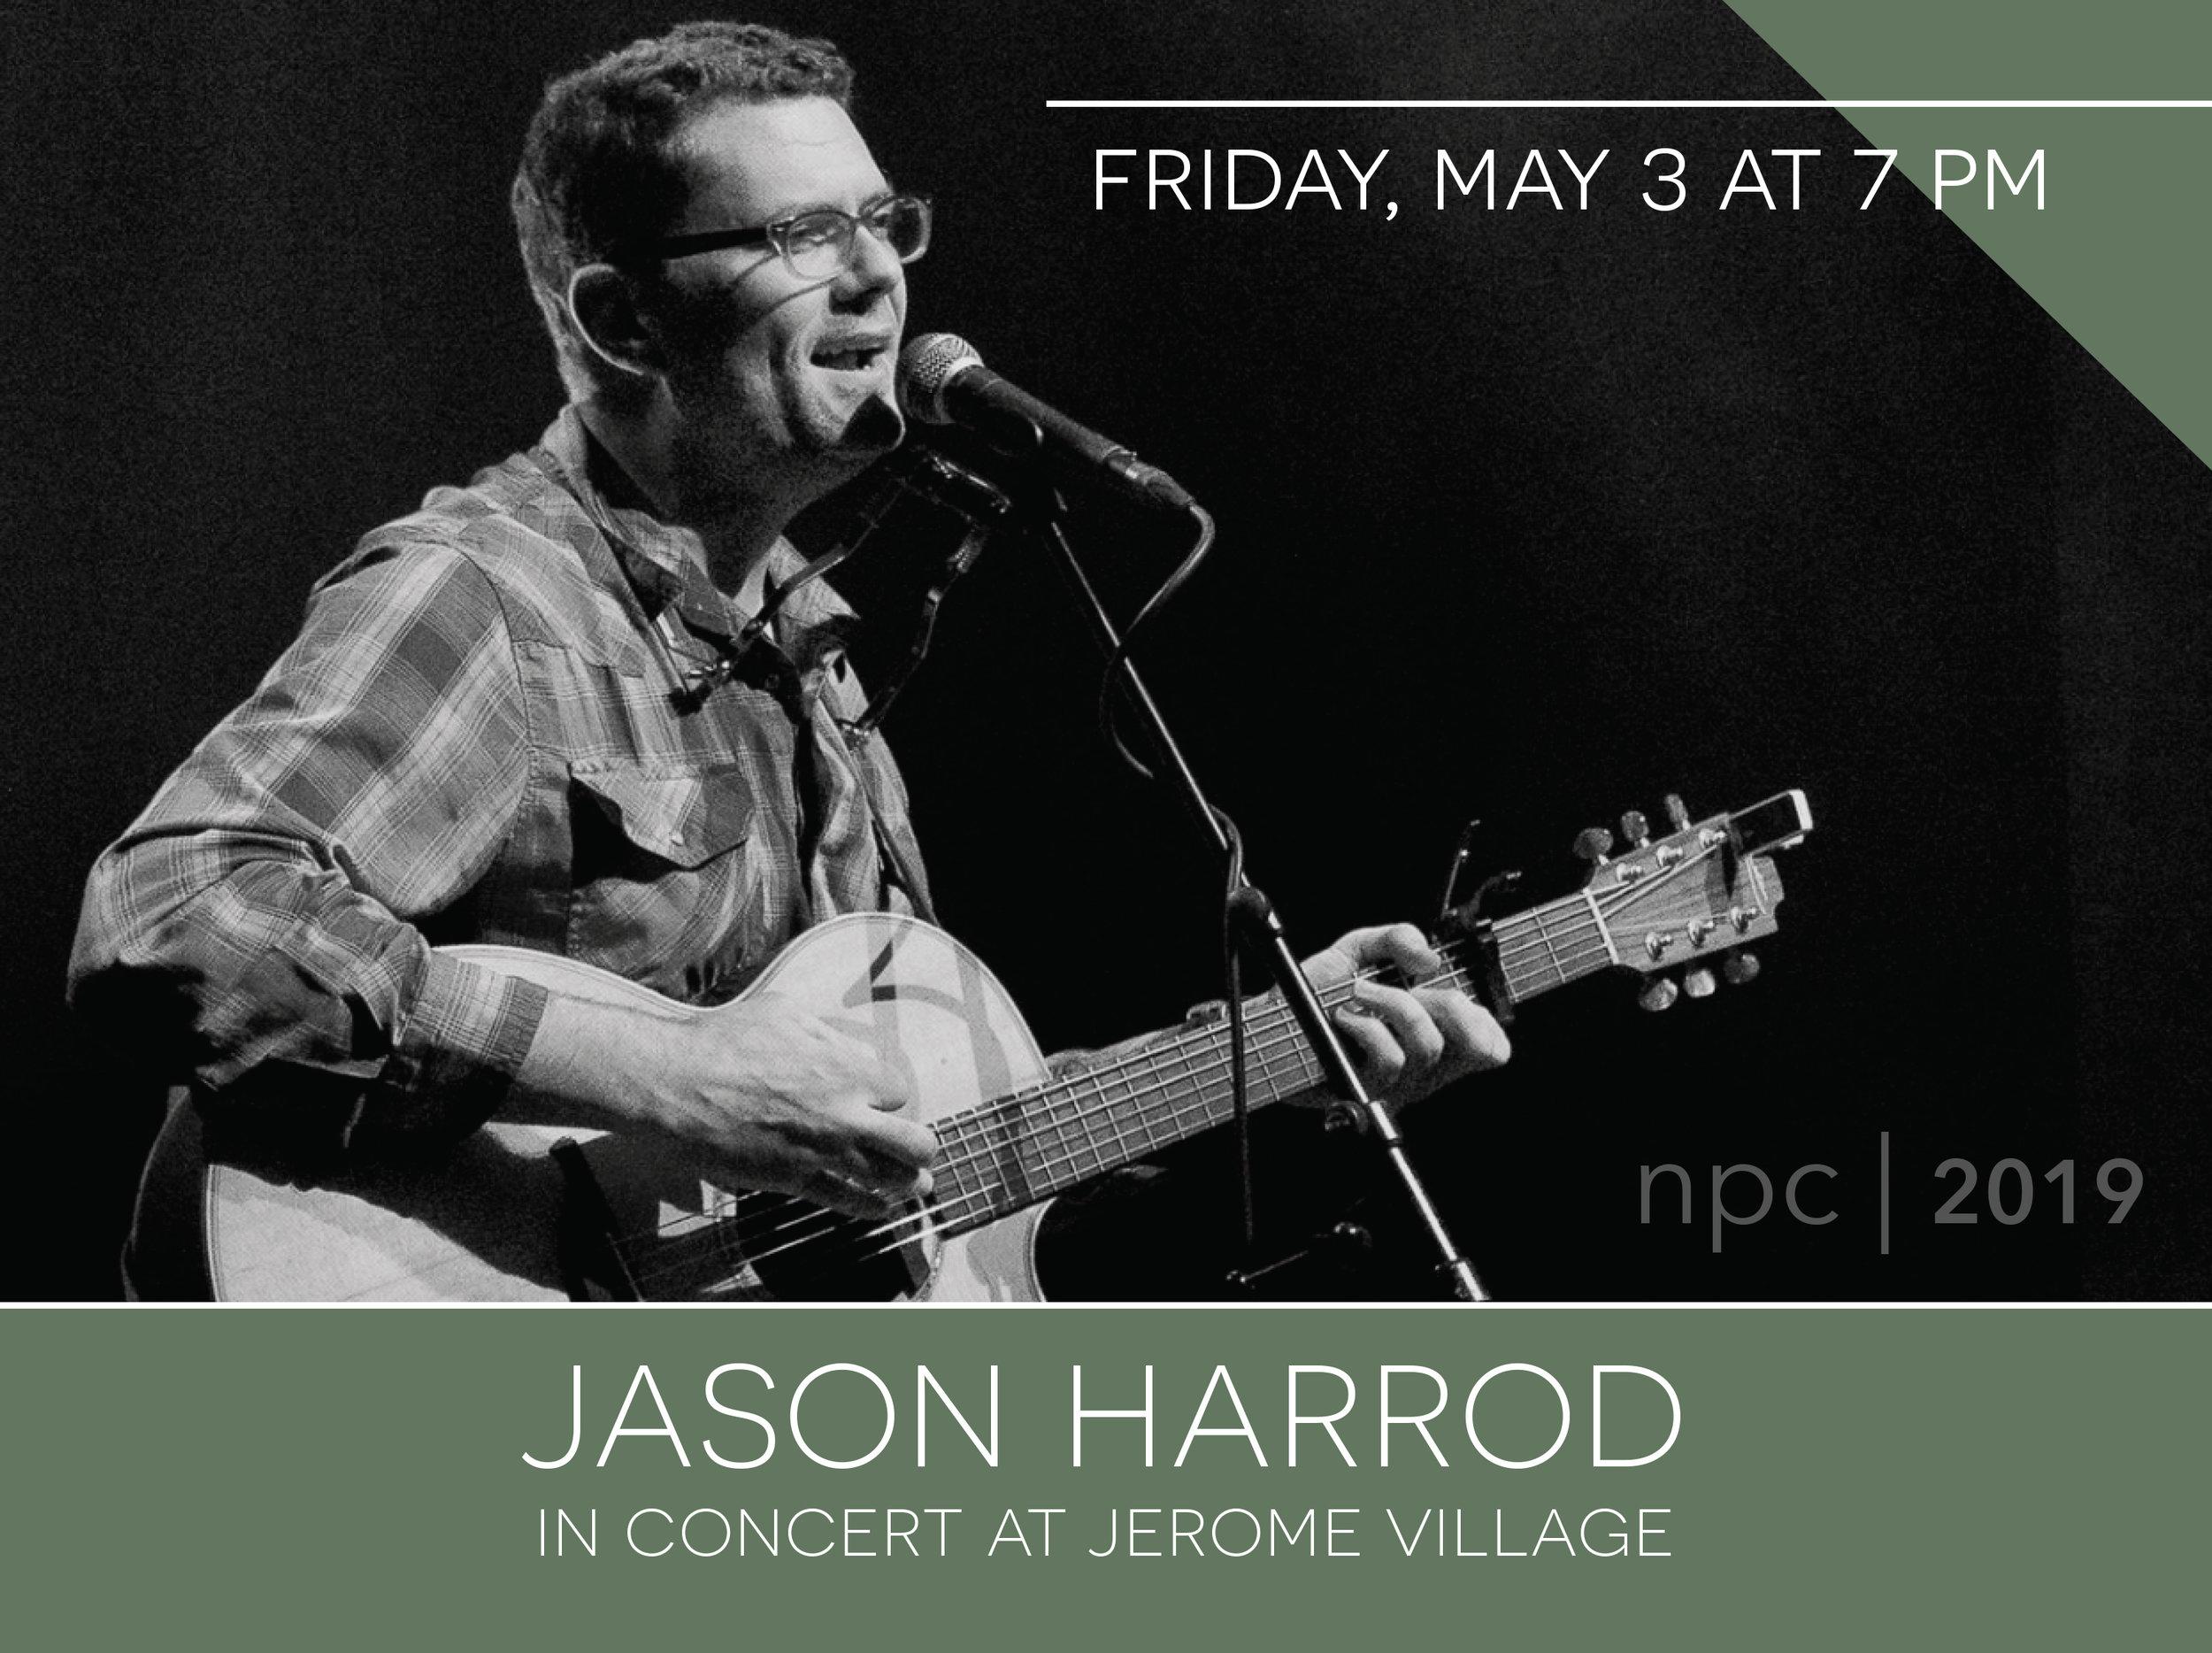 Jason Harrod2.jpg